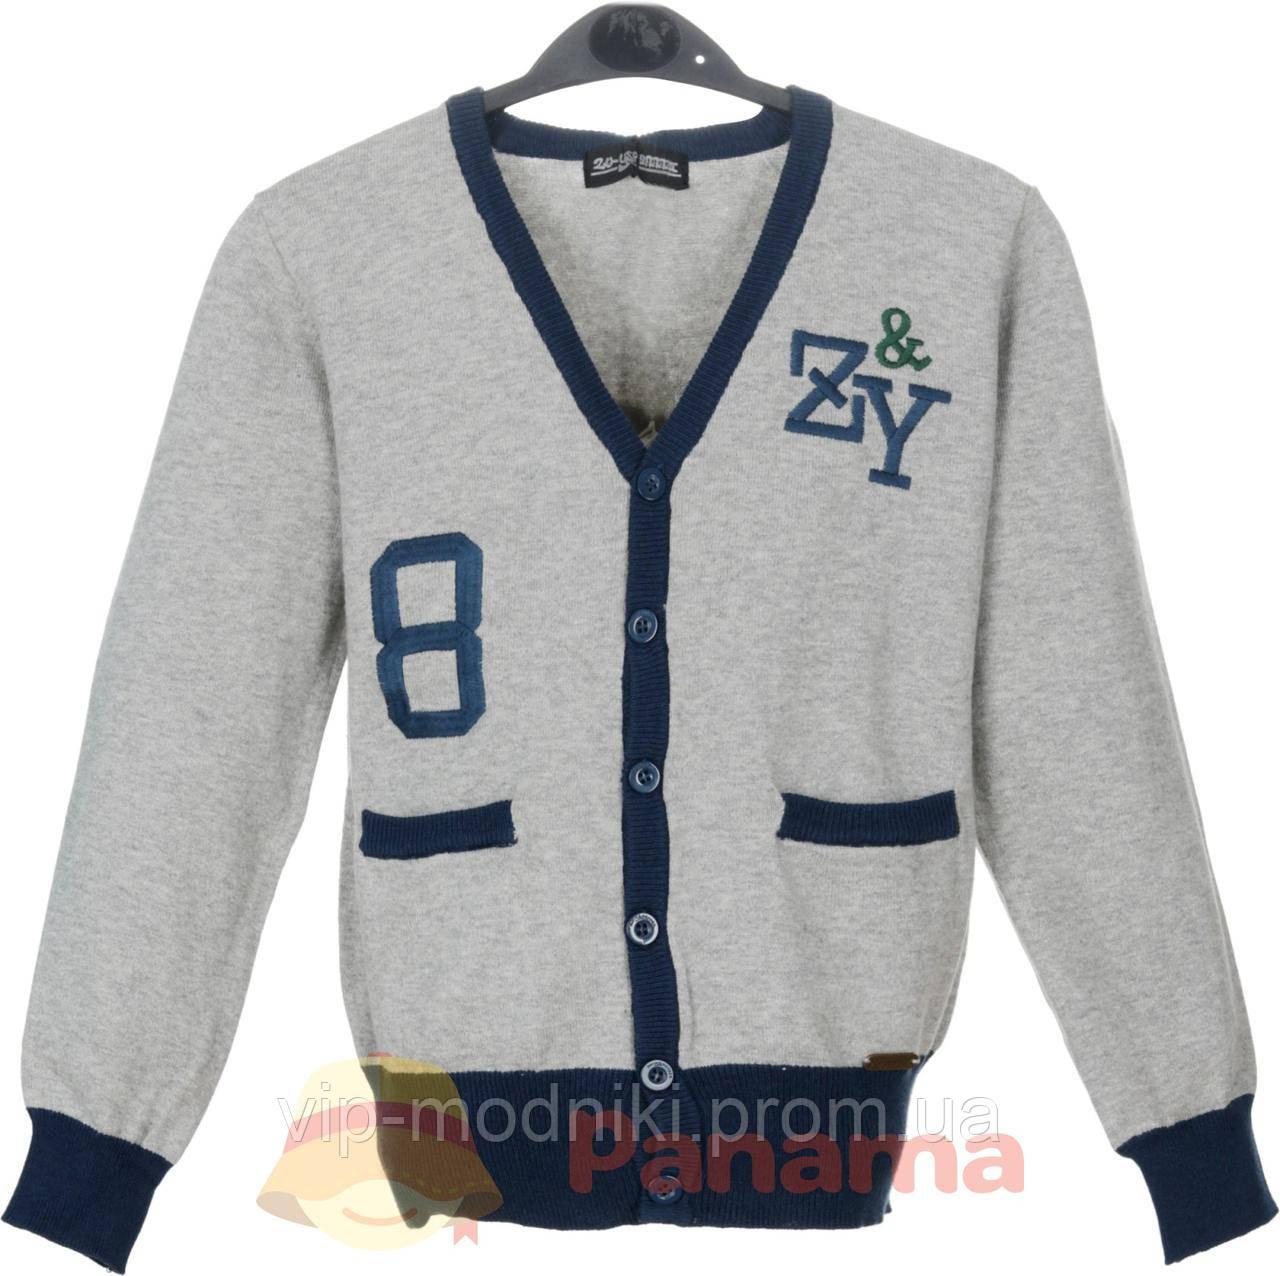 Кофта для мальчика,серый с синим Zu-Yspanici.